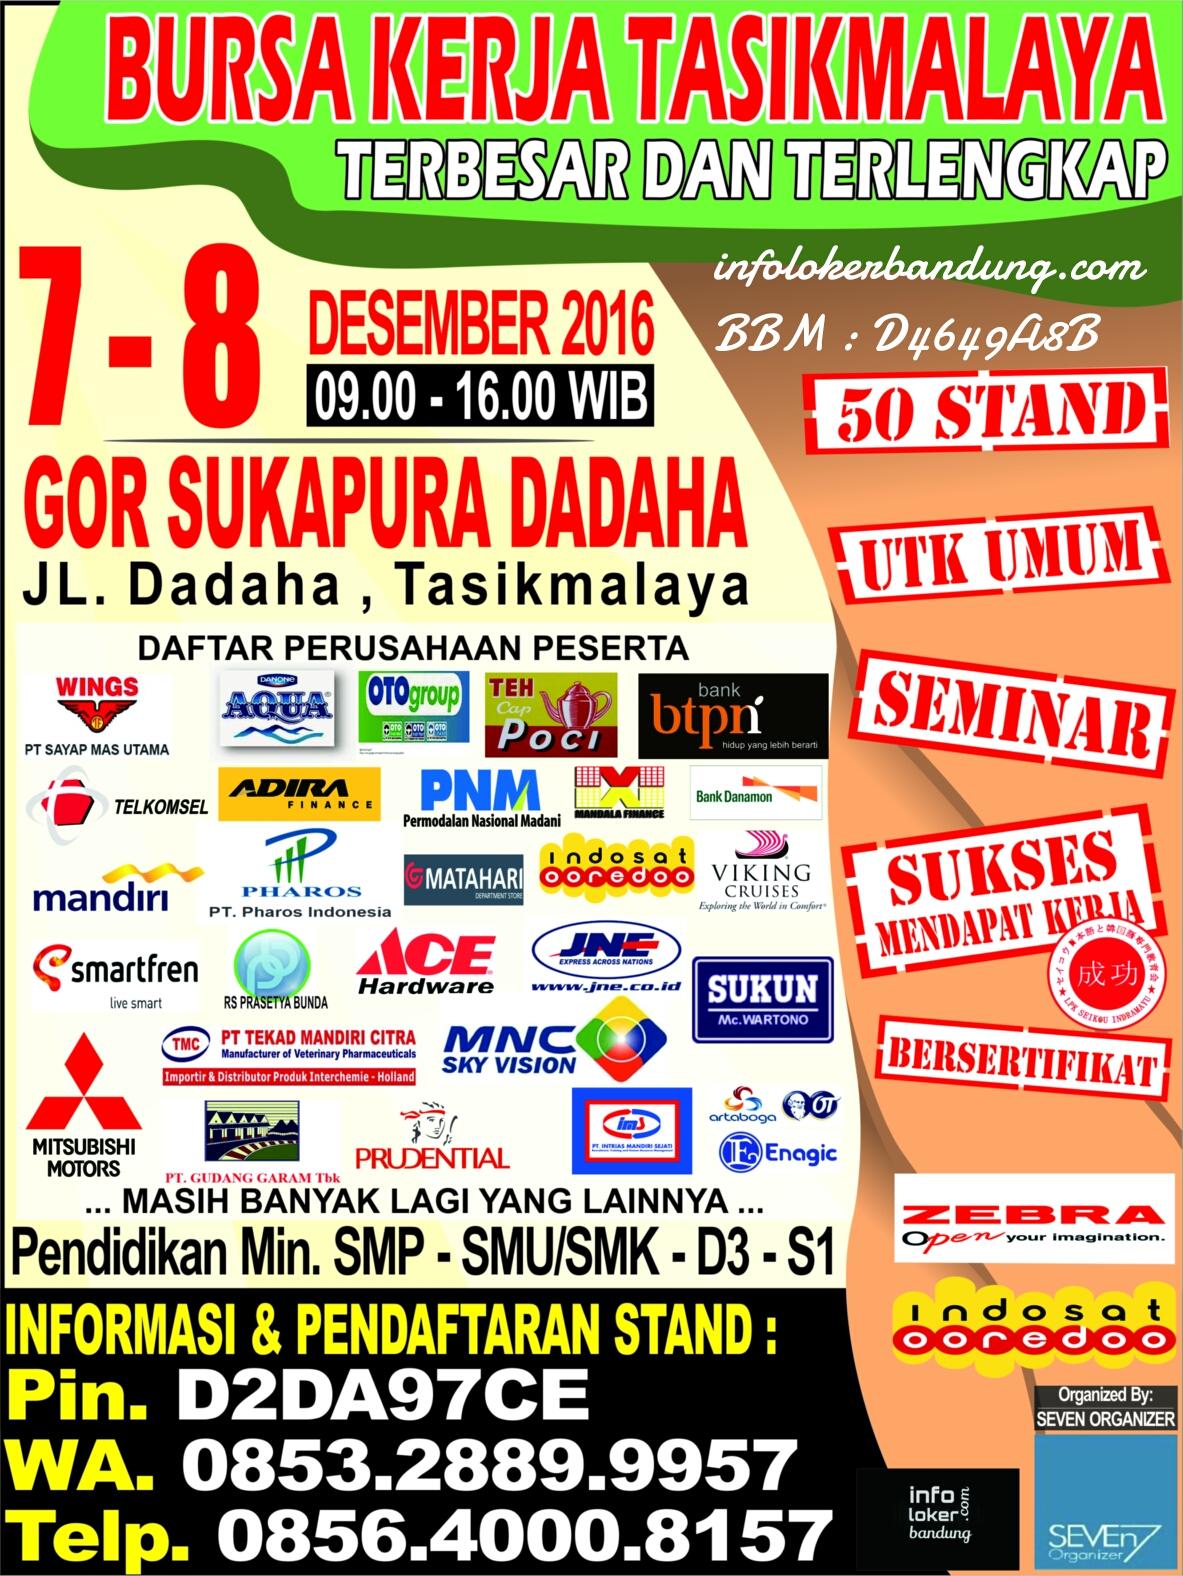 Job Fair Tasikmalaya 7 - 8 Desember 2016